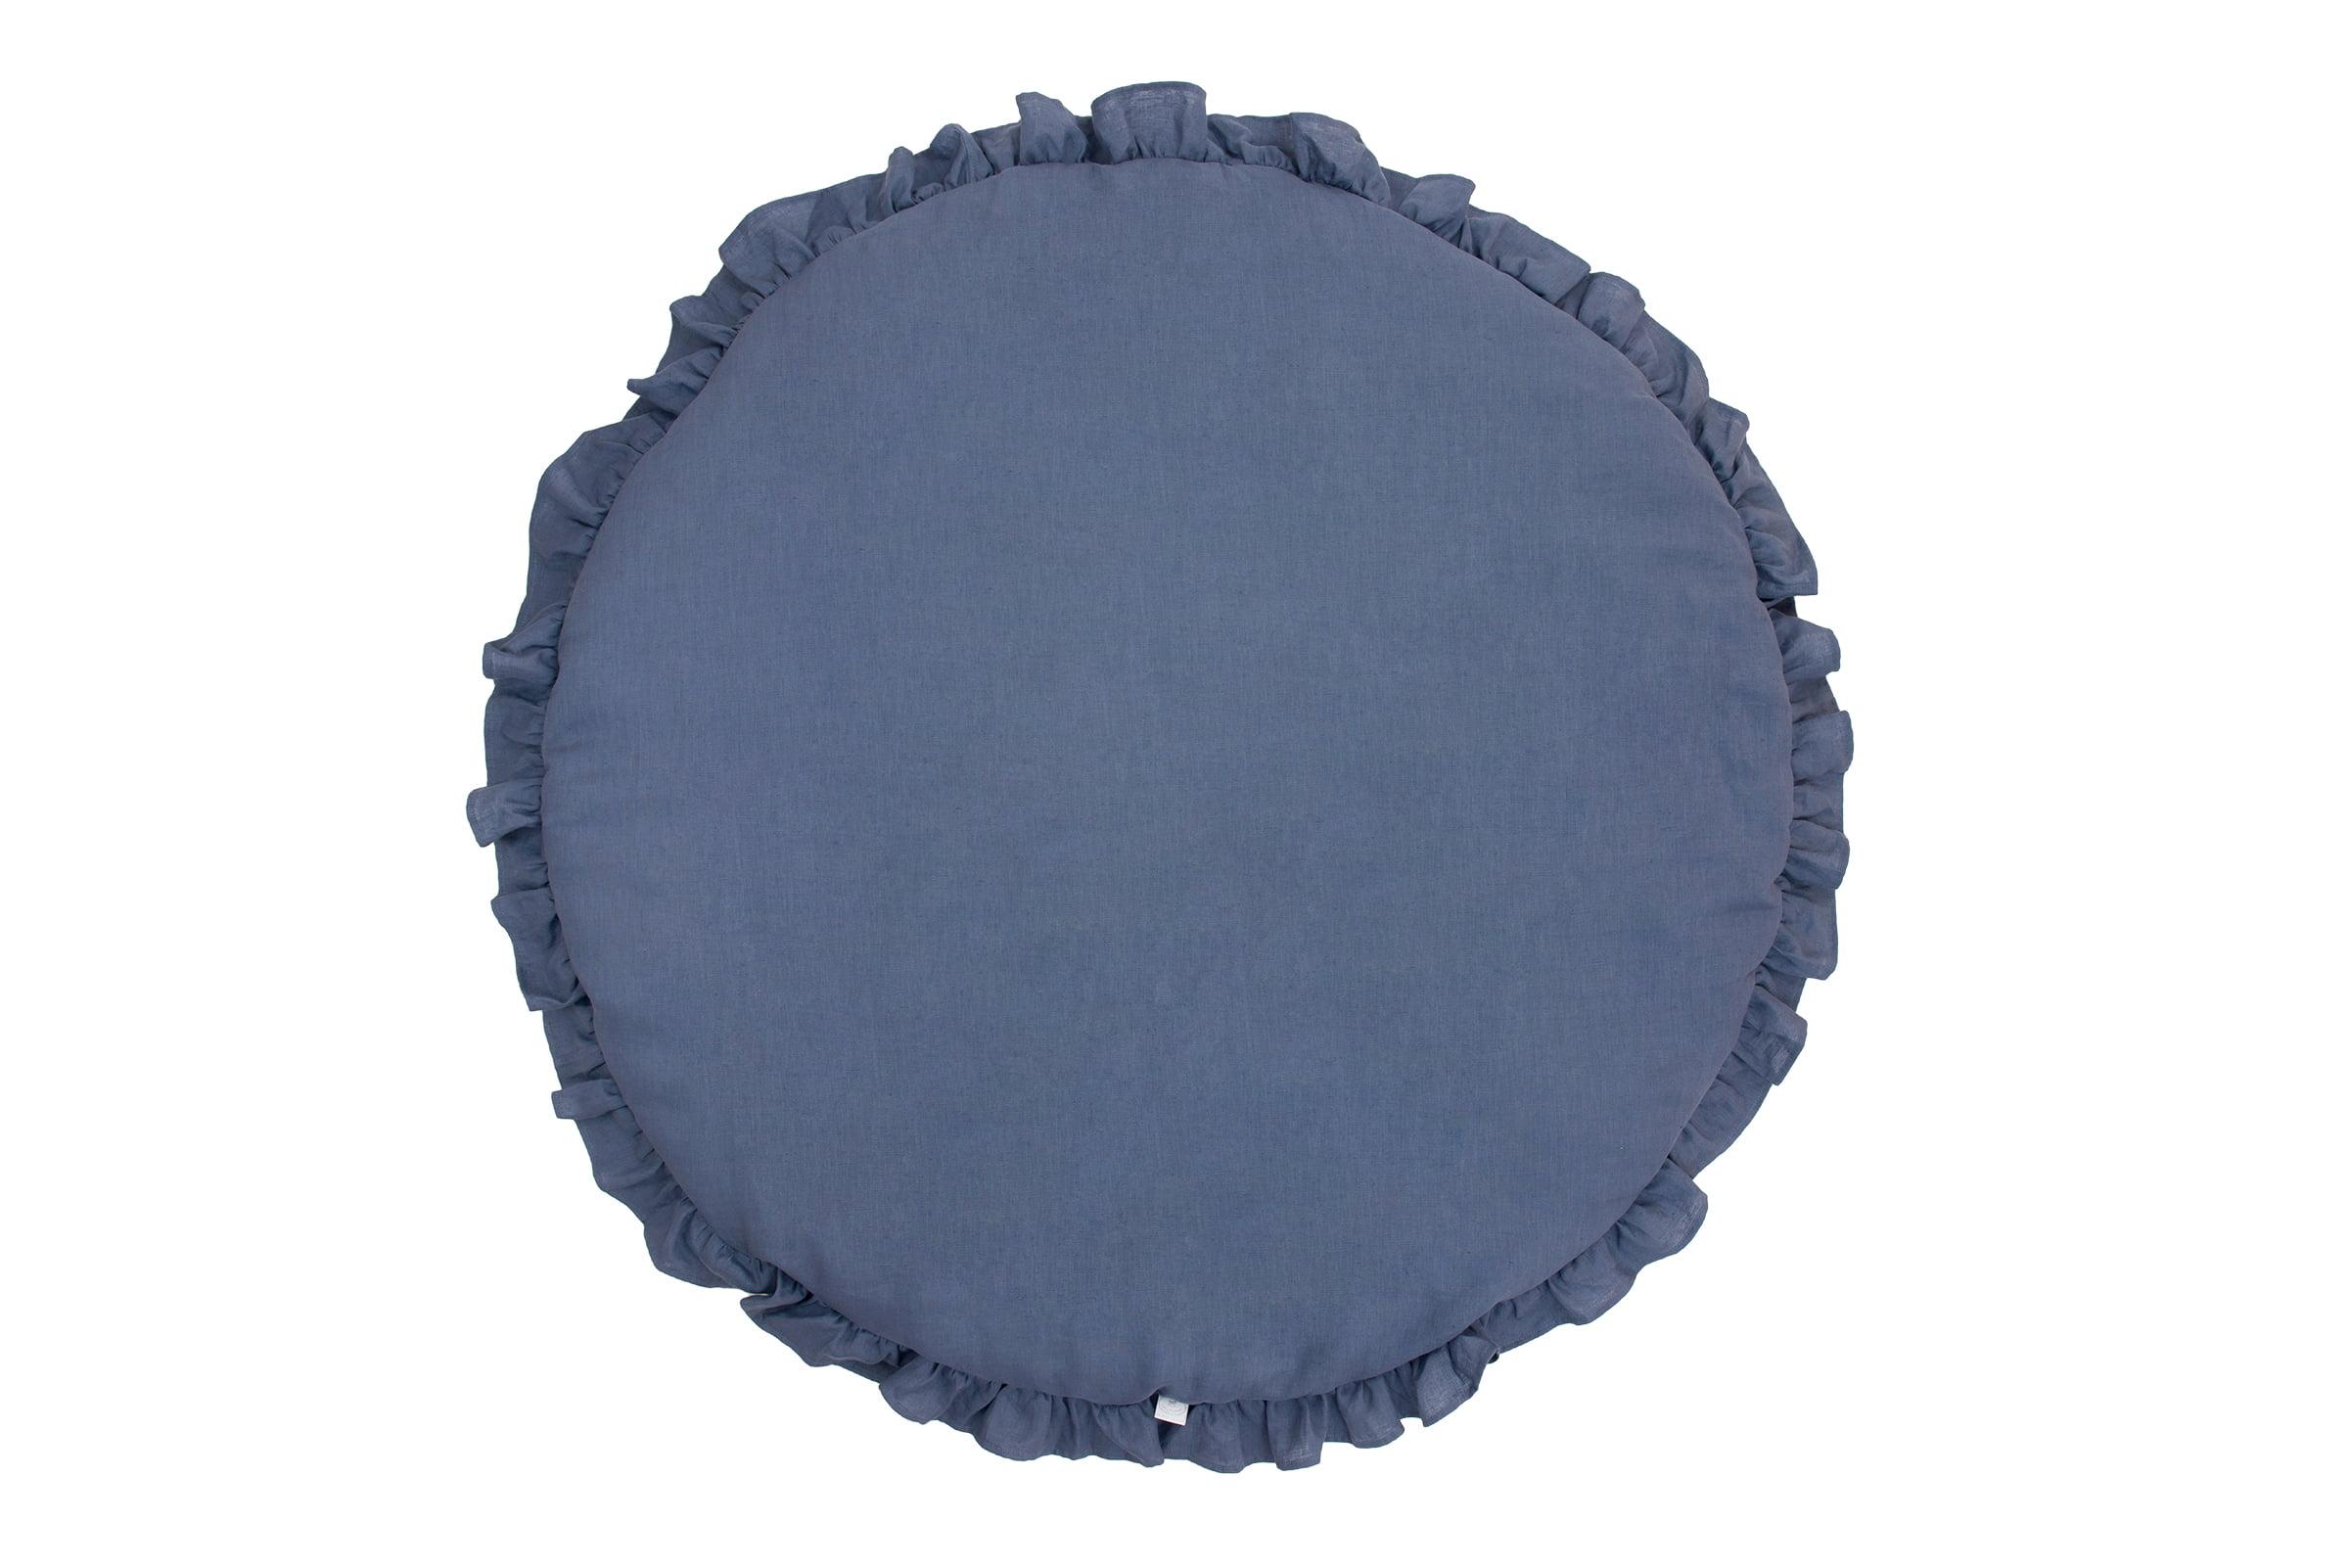 podlozka-lanova-modra-dadaboom-sk.JPG.png